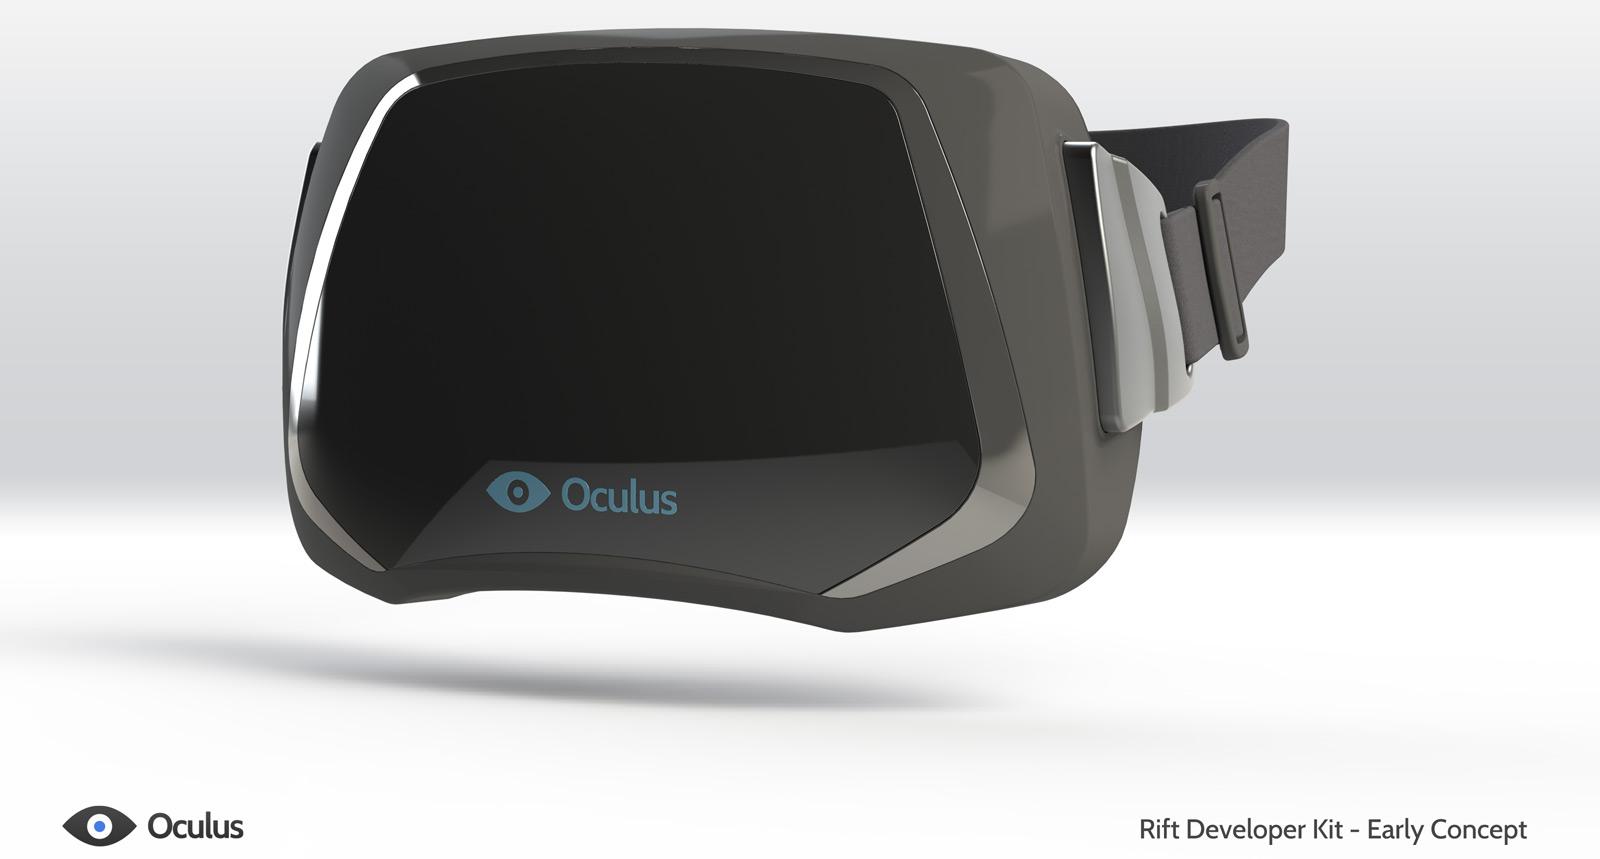 Facebook Buys Oculus Rift for $2 Billion Dollars